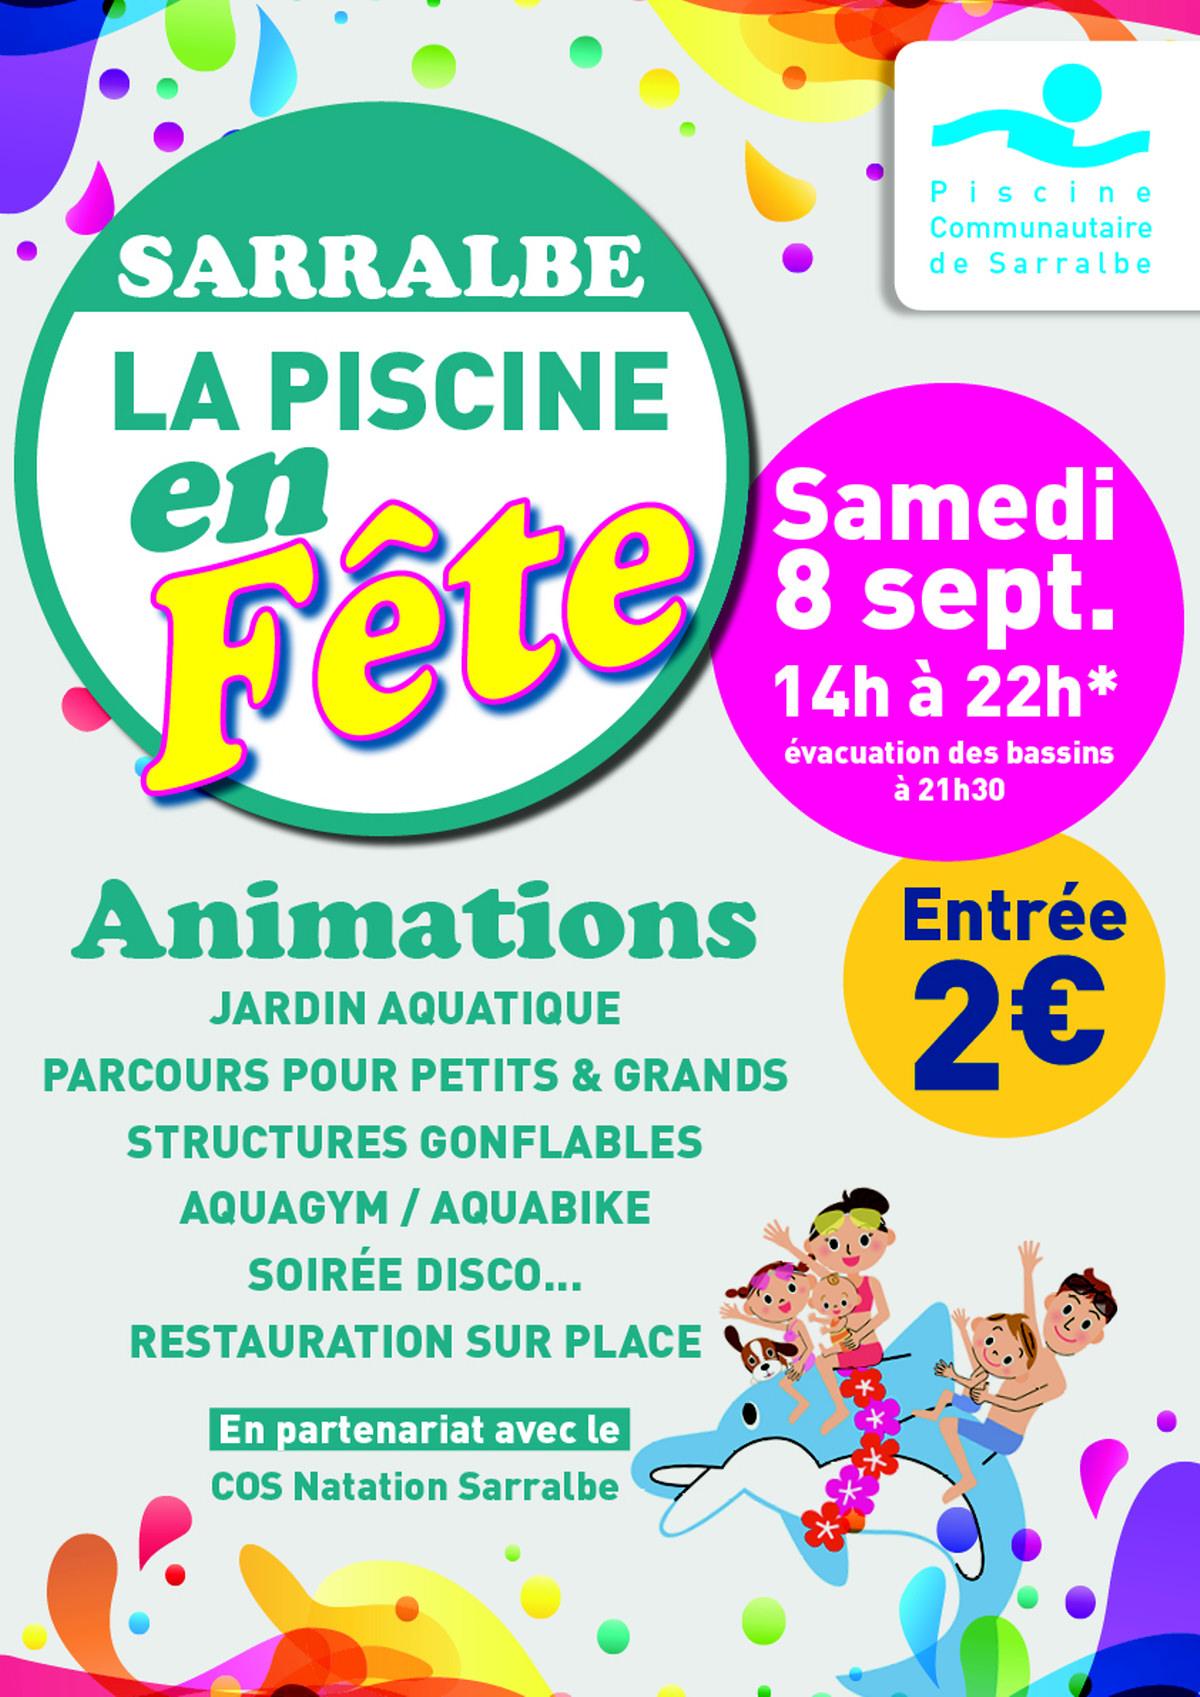 Sarralbe : La Piscine En Fête Ce Samedi ! - Radio Mélodie dedans Piscine Sarralbe